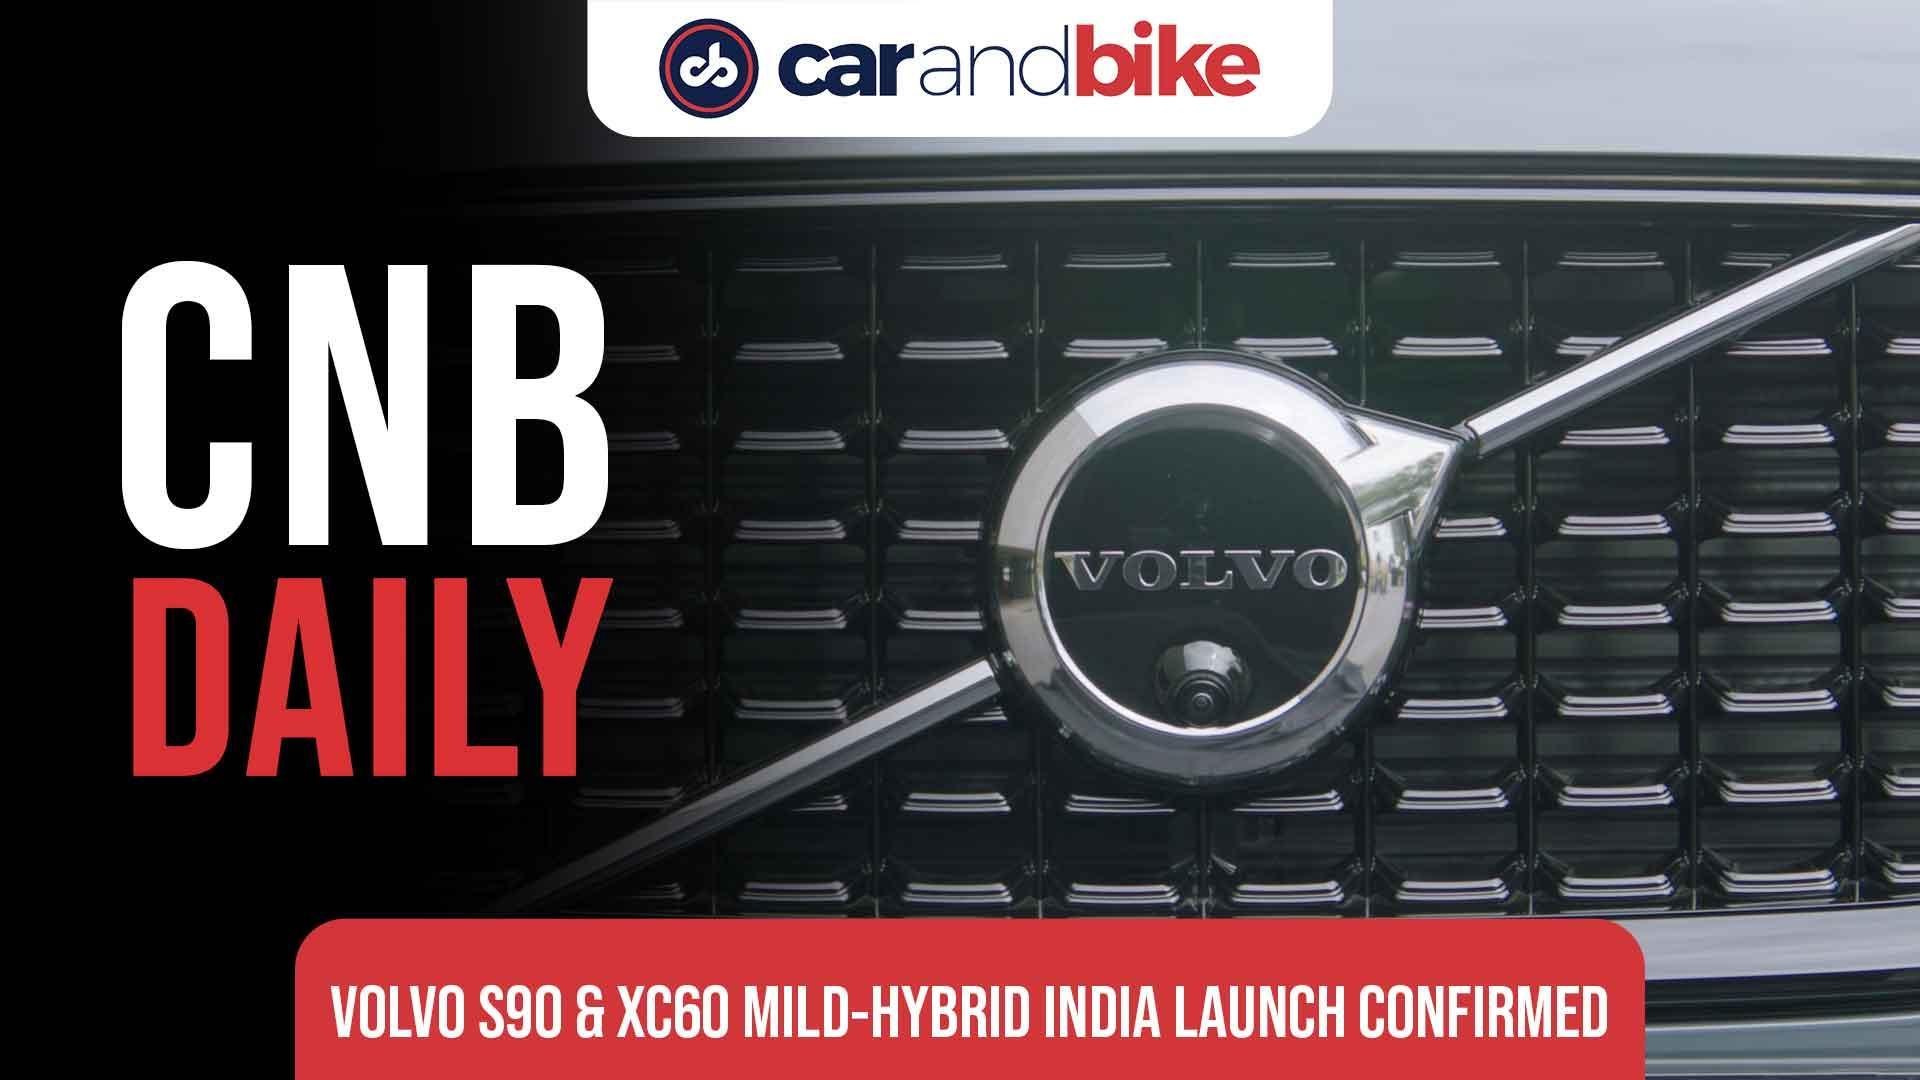 Volvo S90 & XC60 Mild-Hybrid India launch confirmed